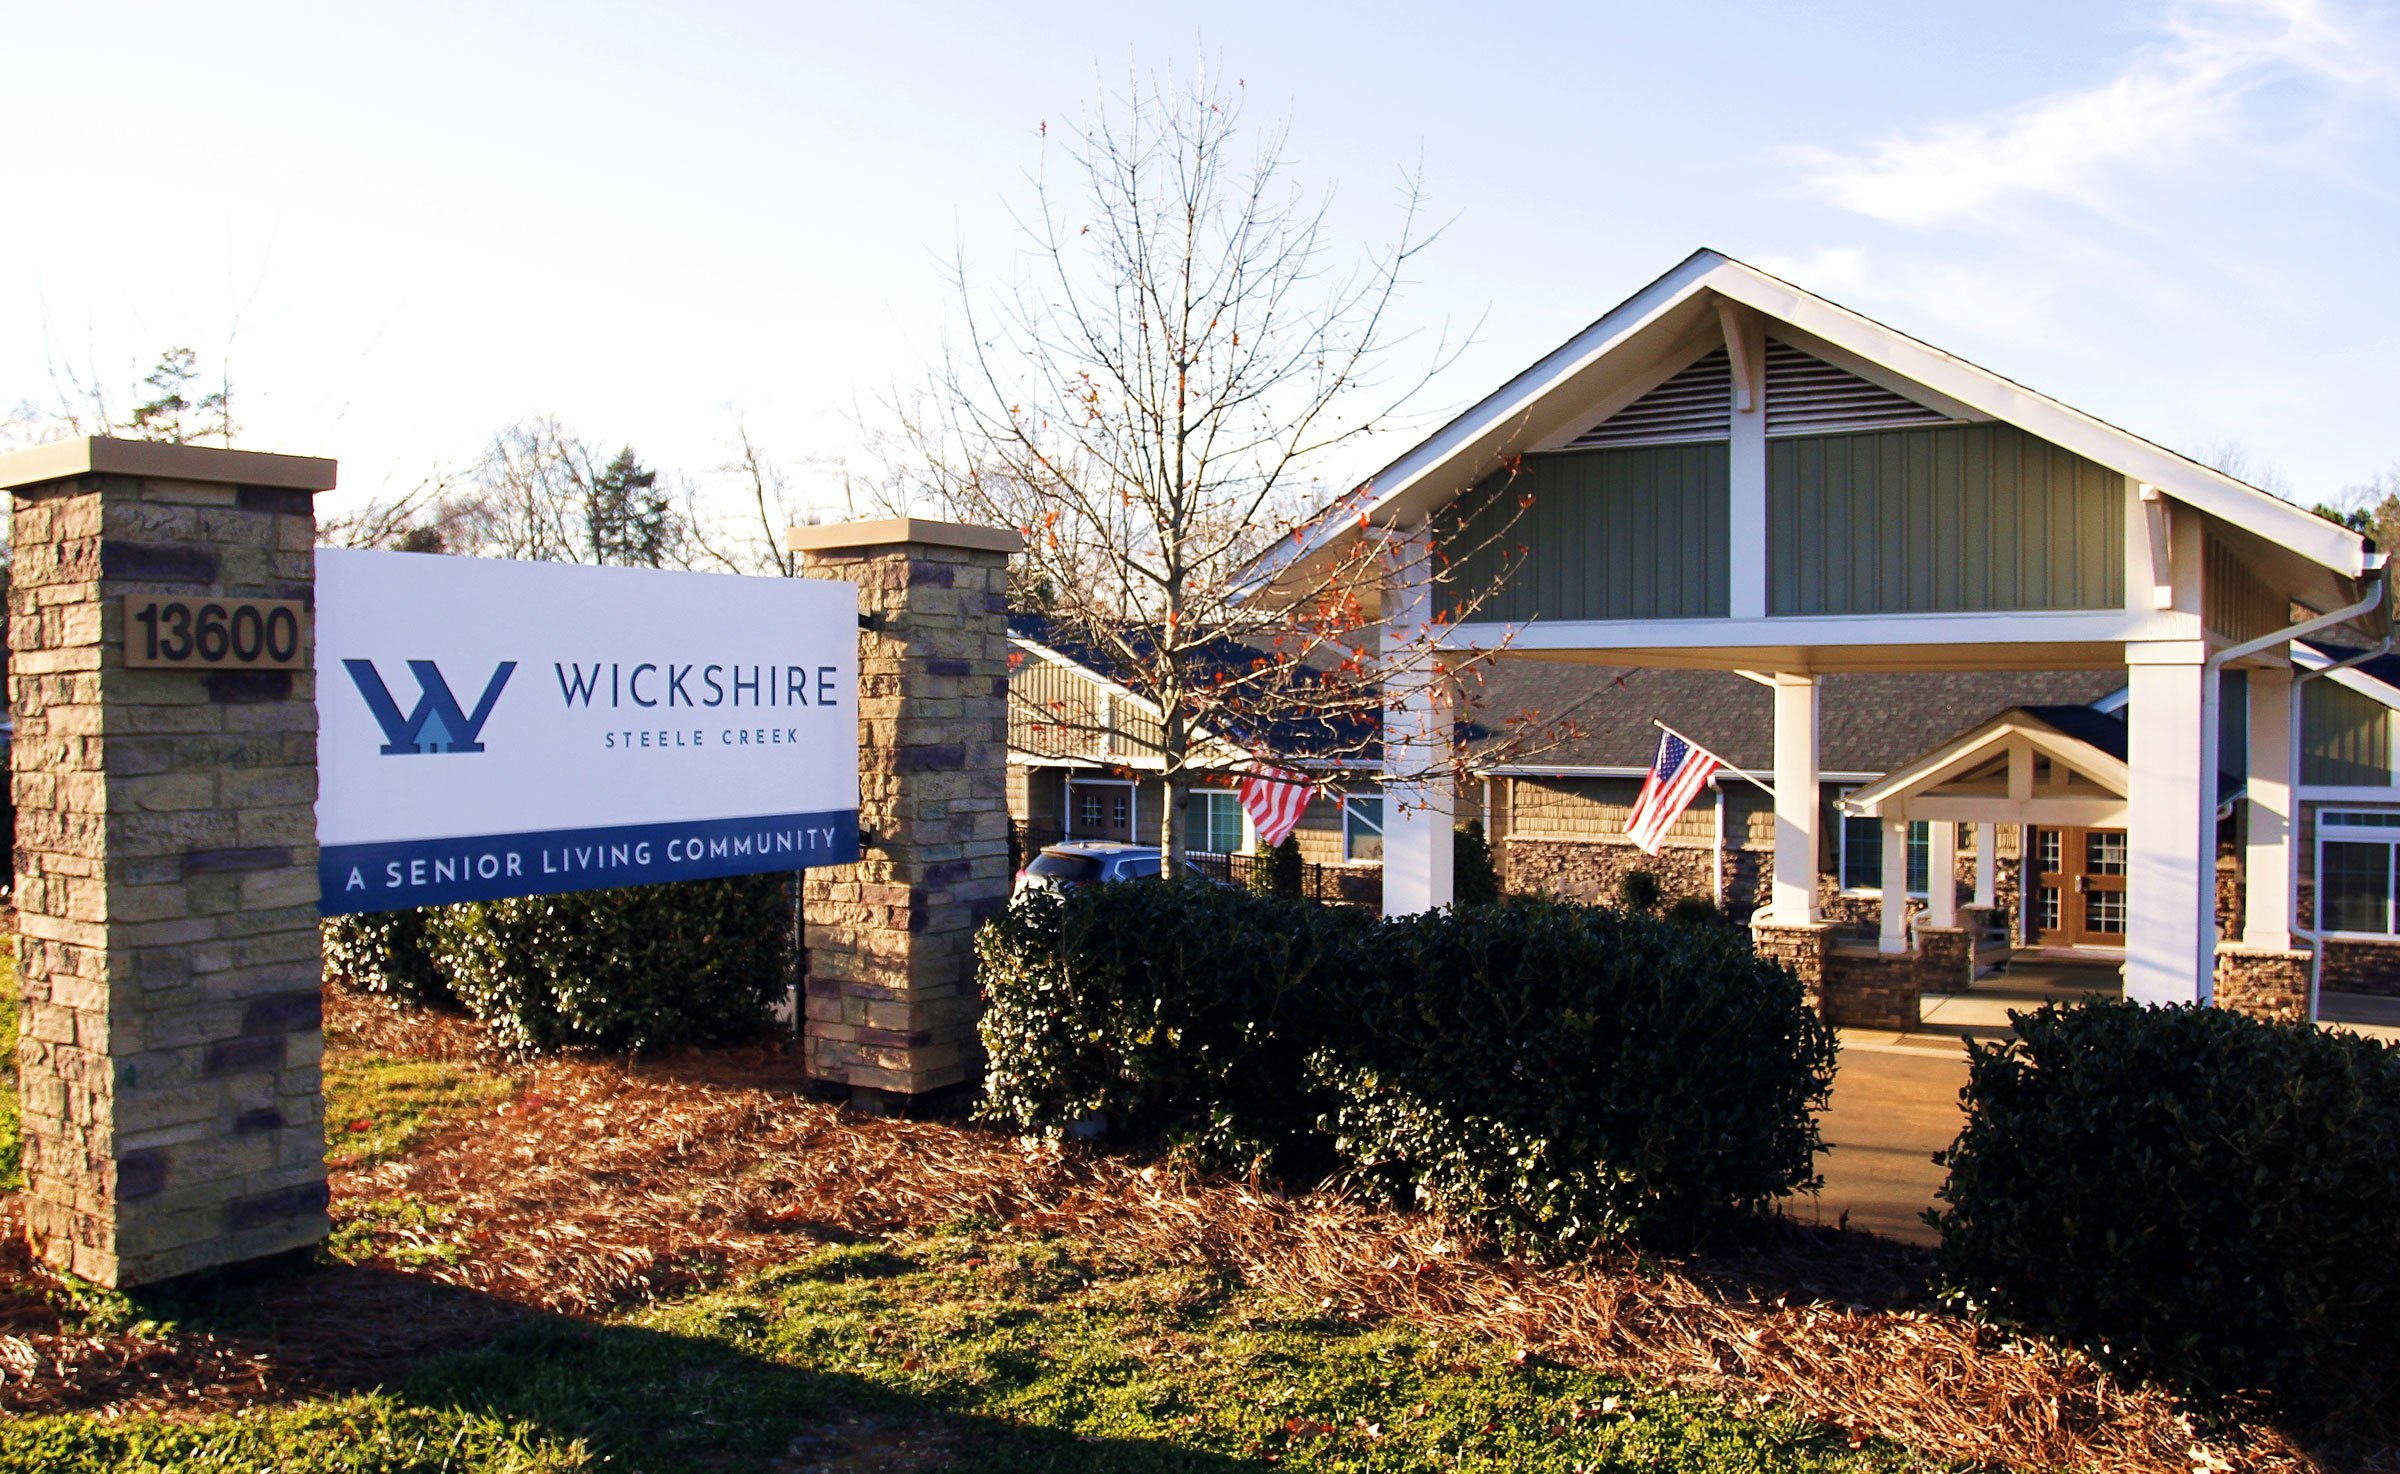 Wickshire Senior Living Steele Creek